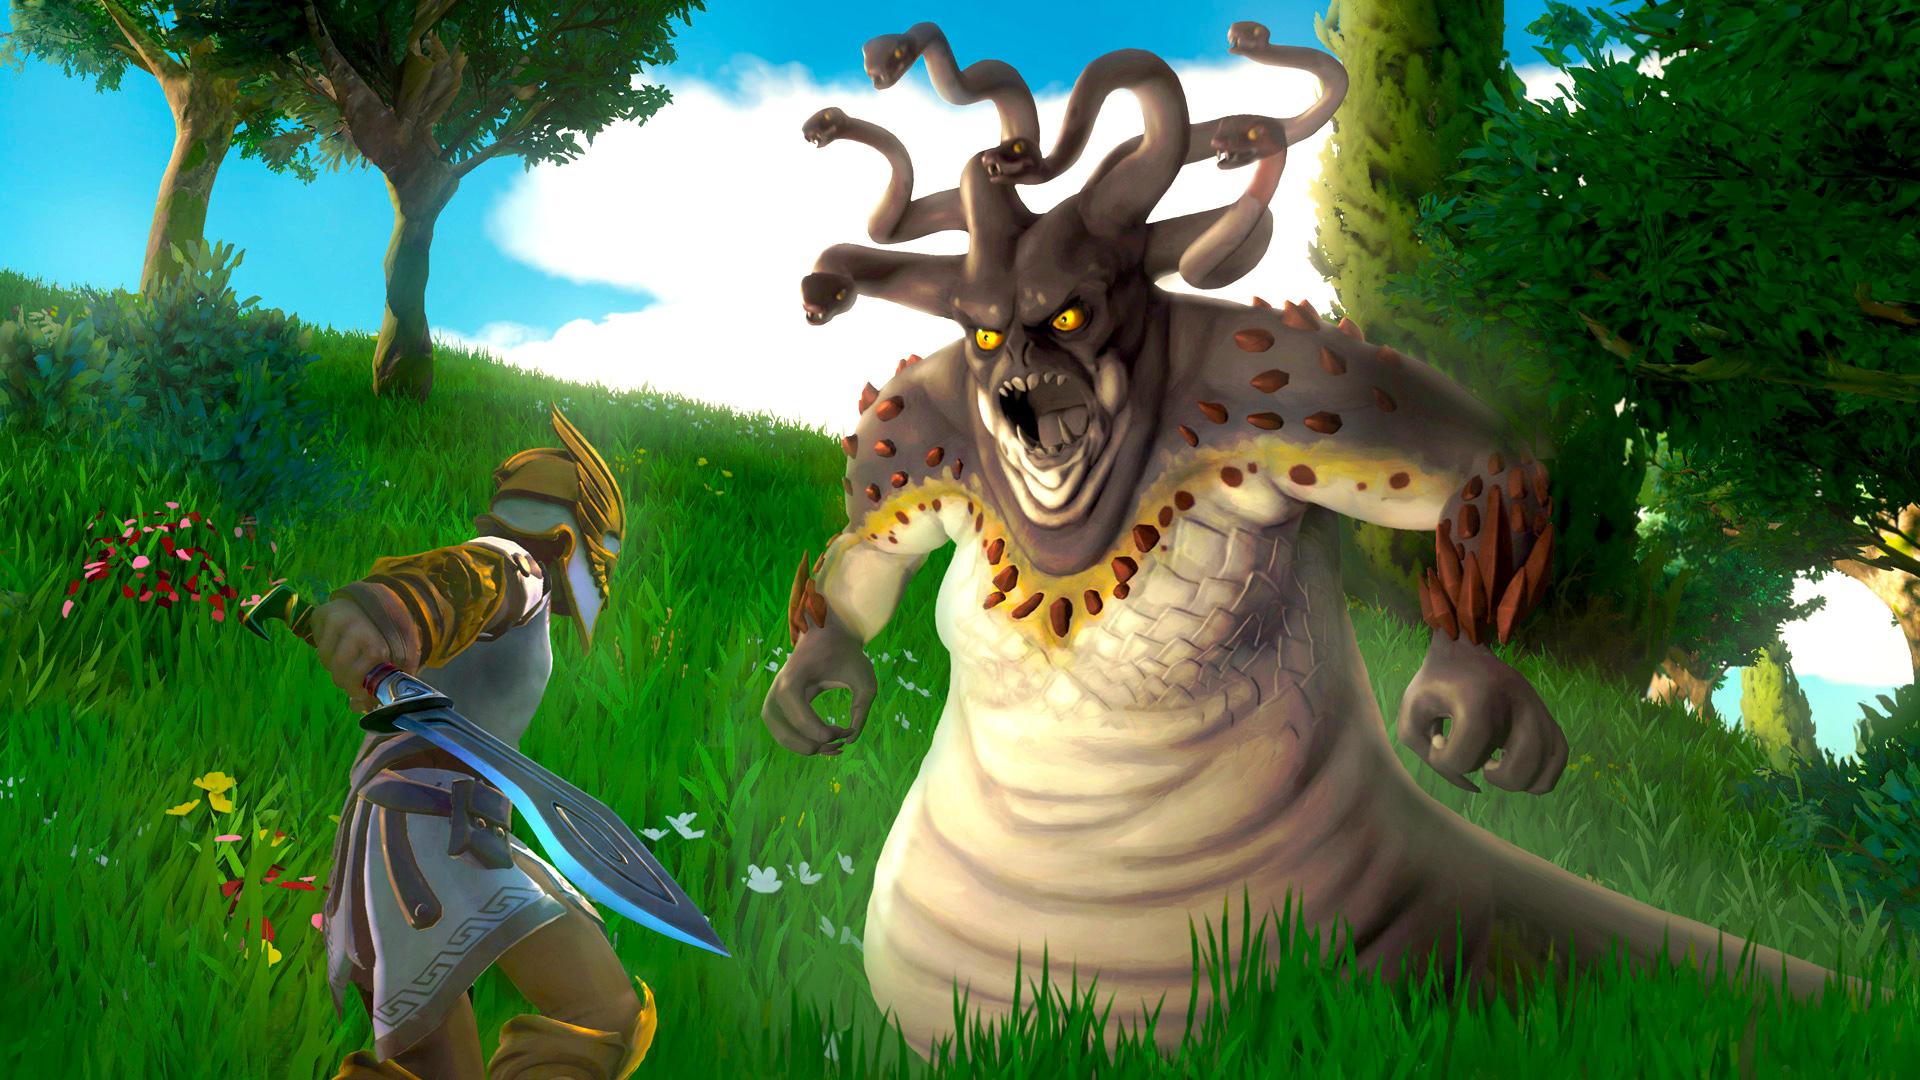 gods monsters hydra